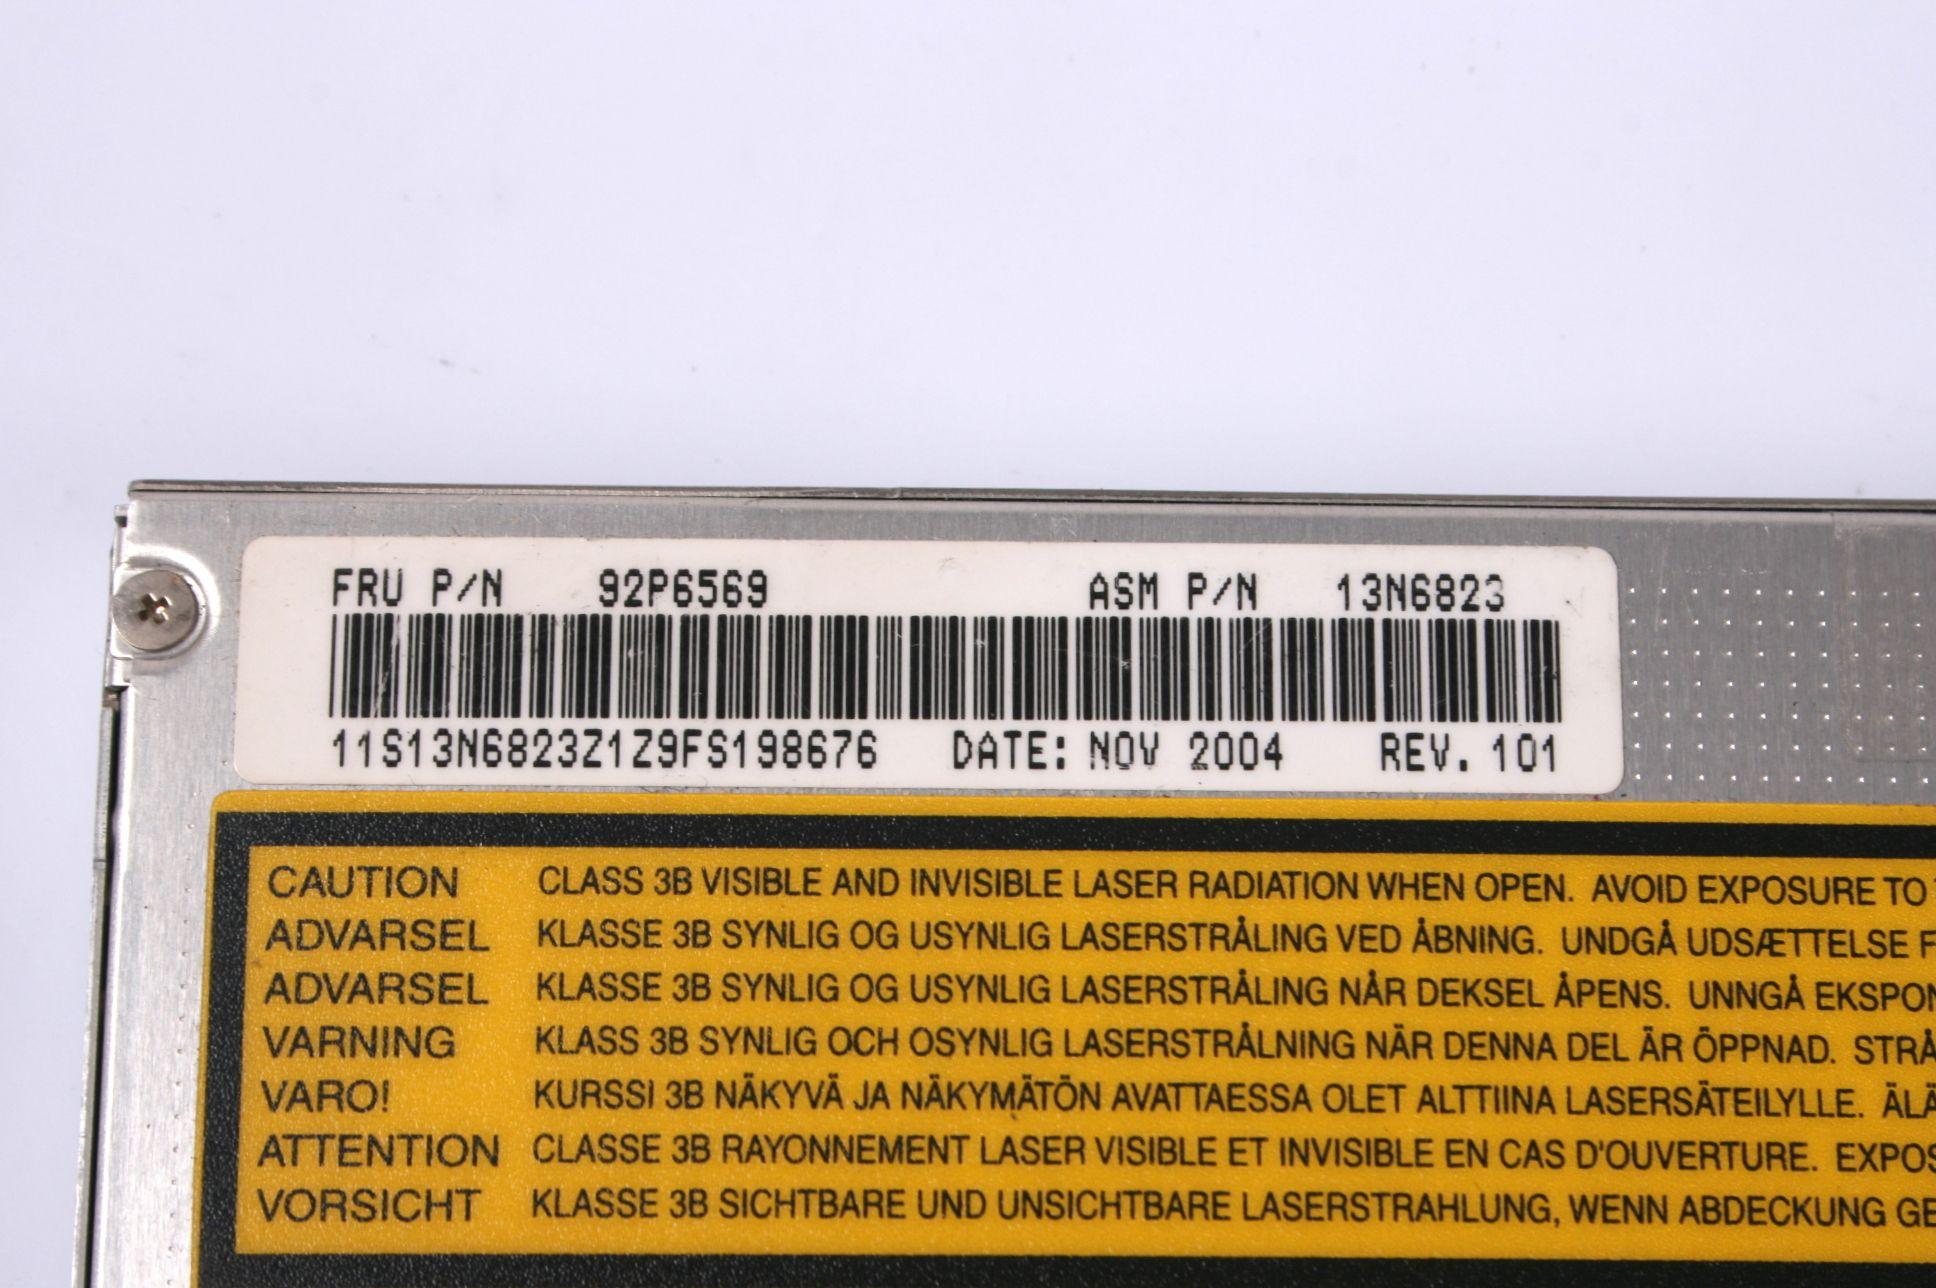 IBM Thinkpad R50e R40 R51 T42 T43 CDRW DVD 92P6563 92P6569 13N6823 13N6824 13N6825 08K9868